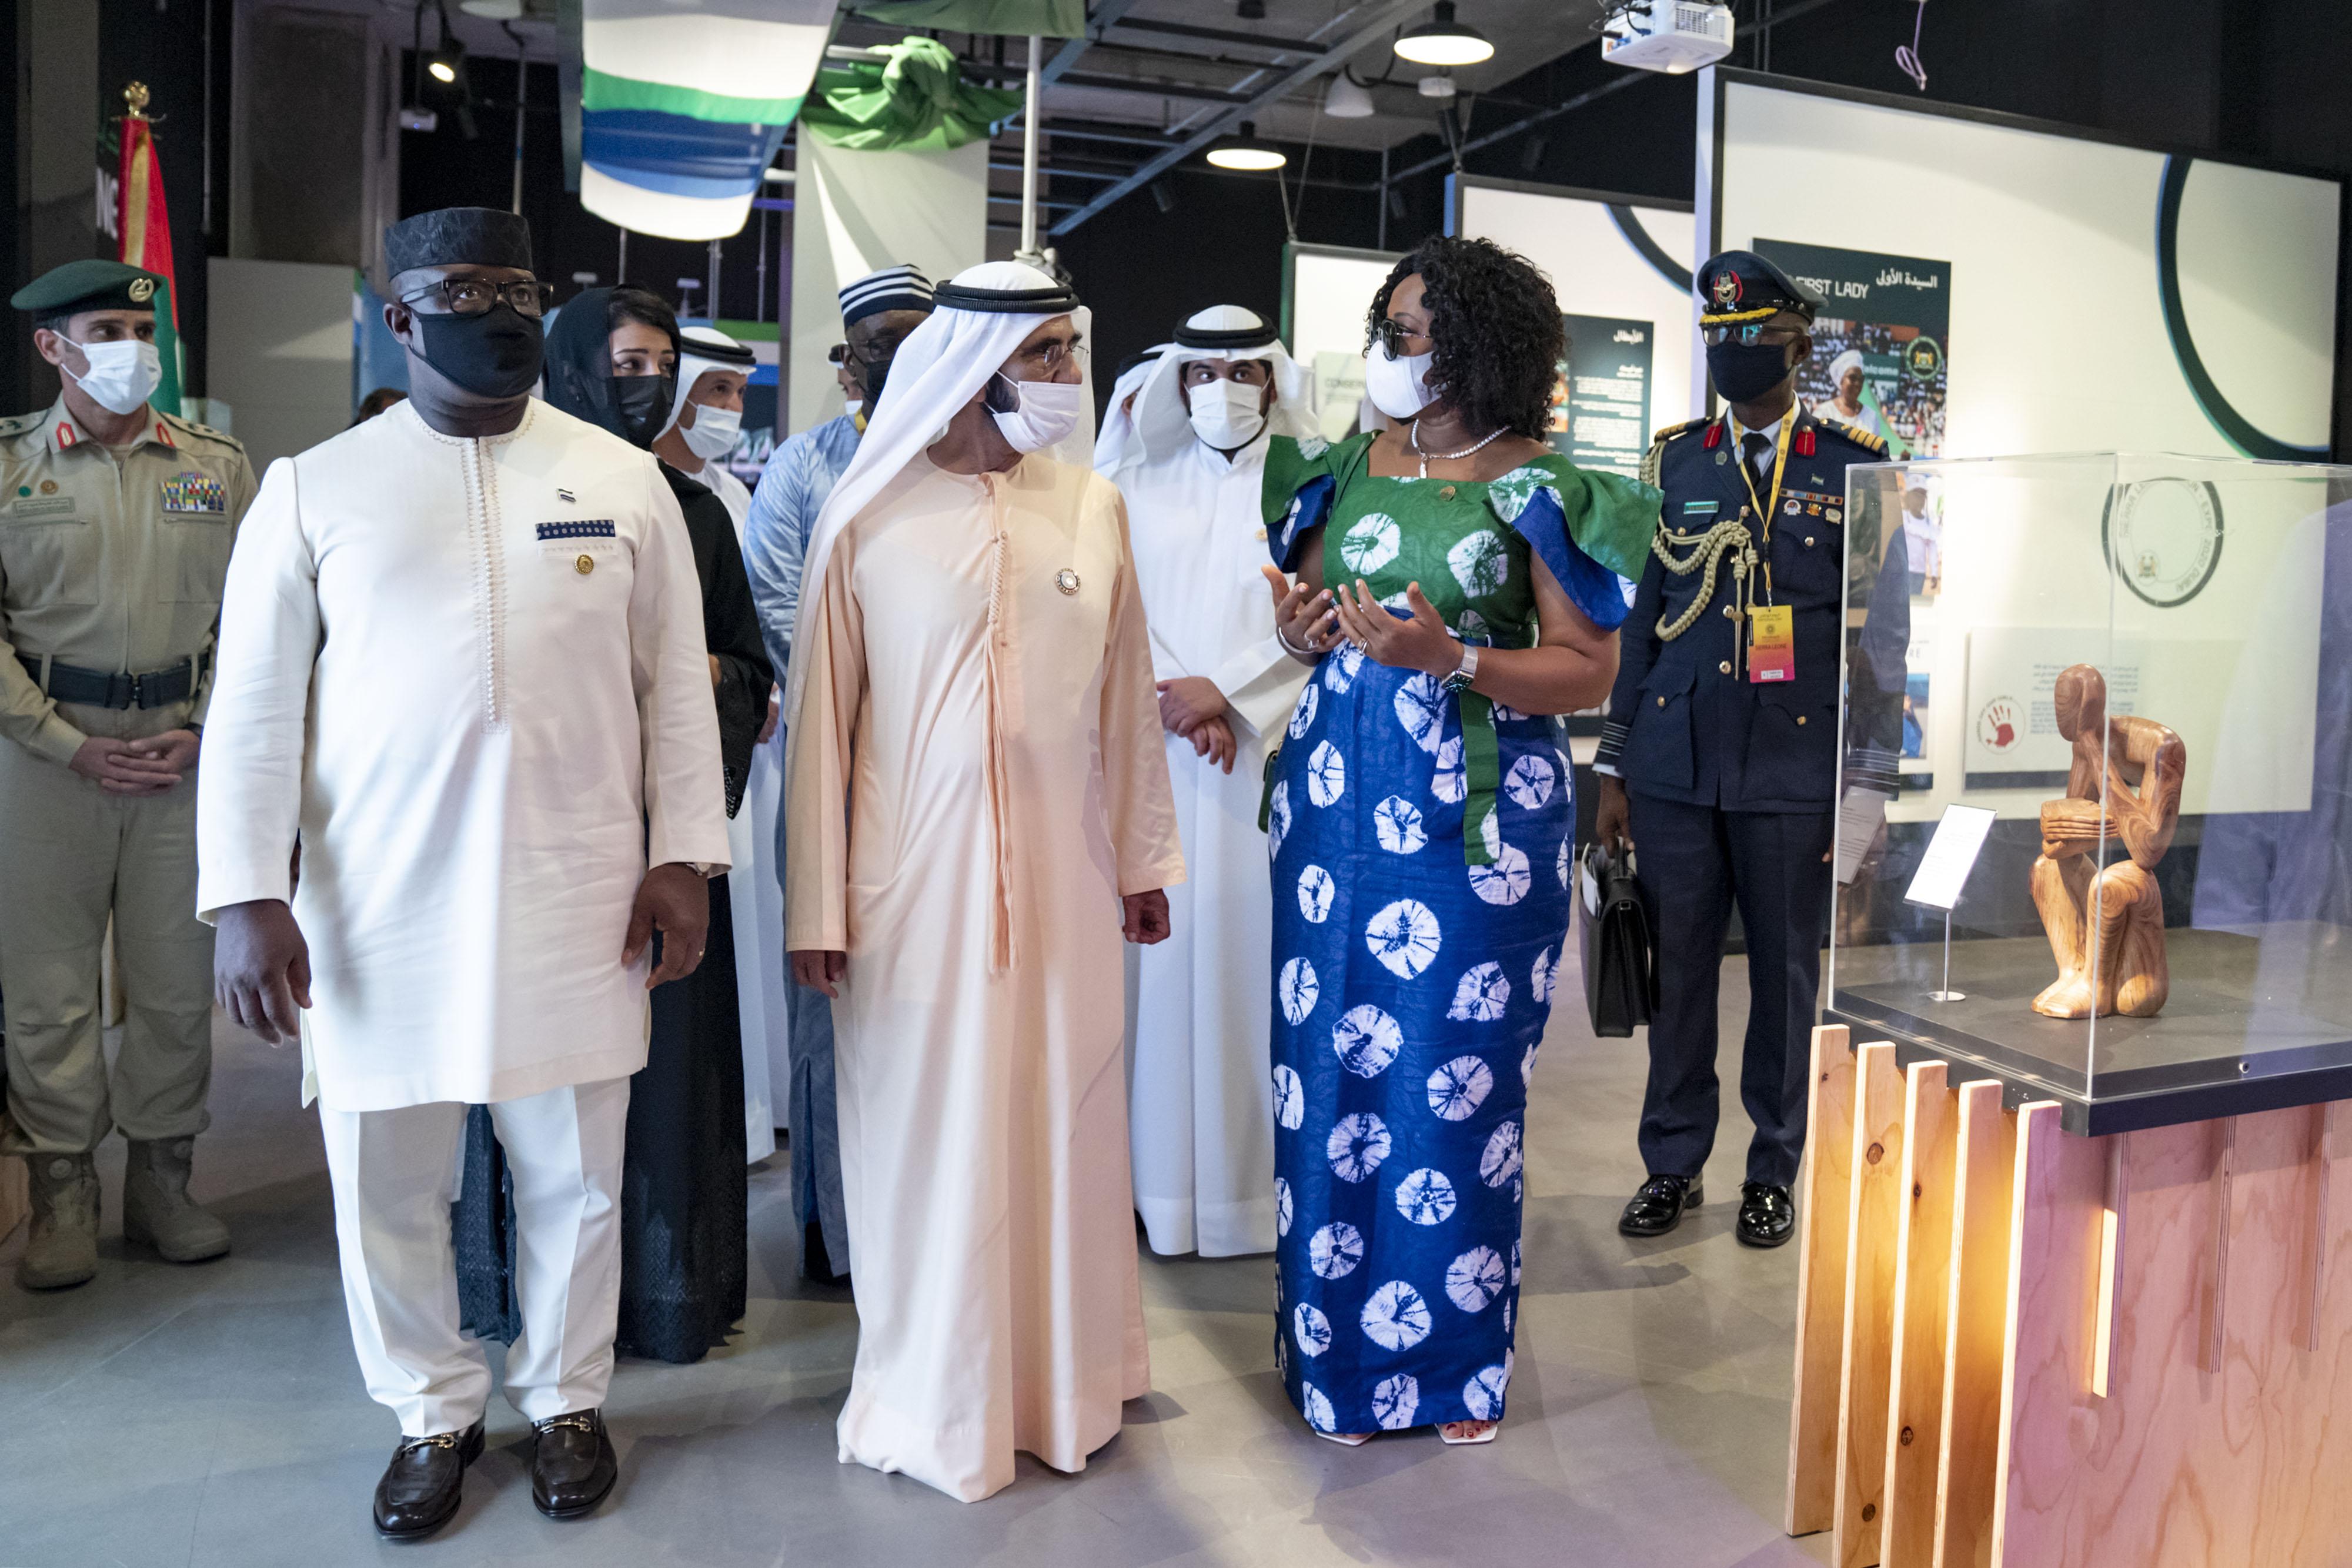 His Highness Sheikh Mohammed bin Rashid Al Maktoum - Mohammed bin Rashid meets with Presidents of Senegal and Sierra Leone at Expo 2020 Dubai